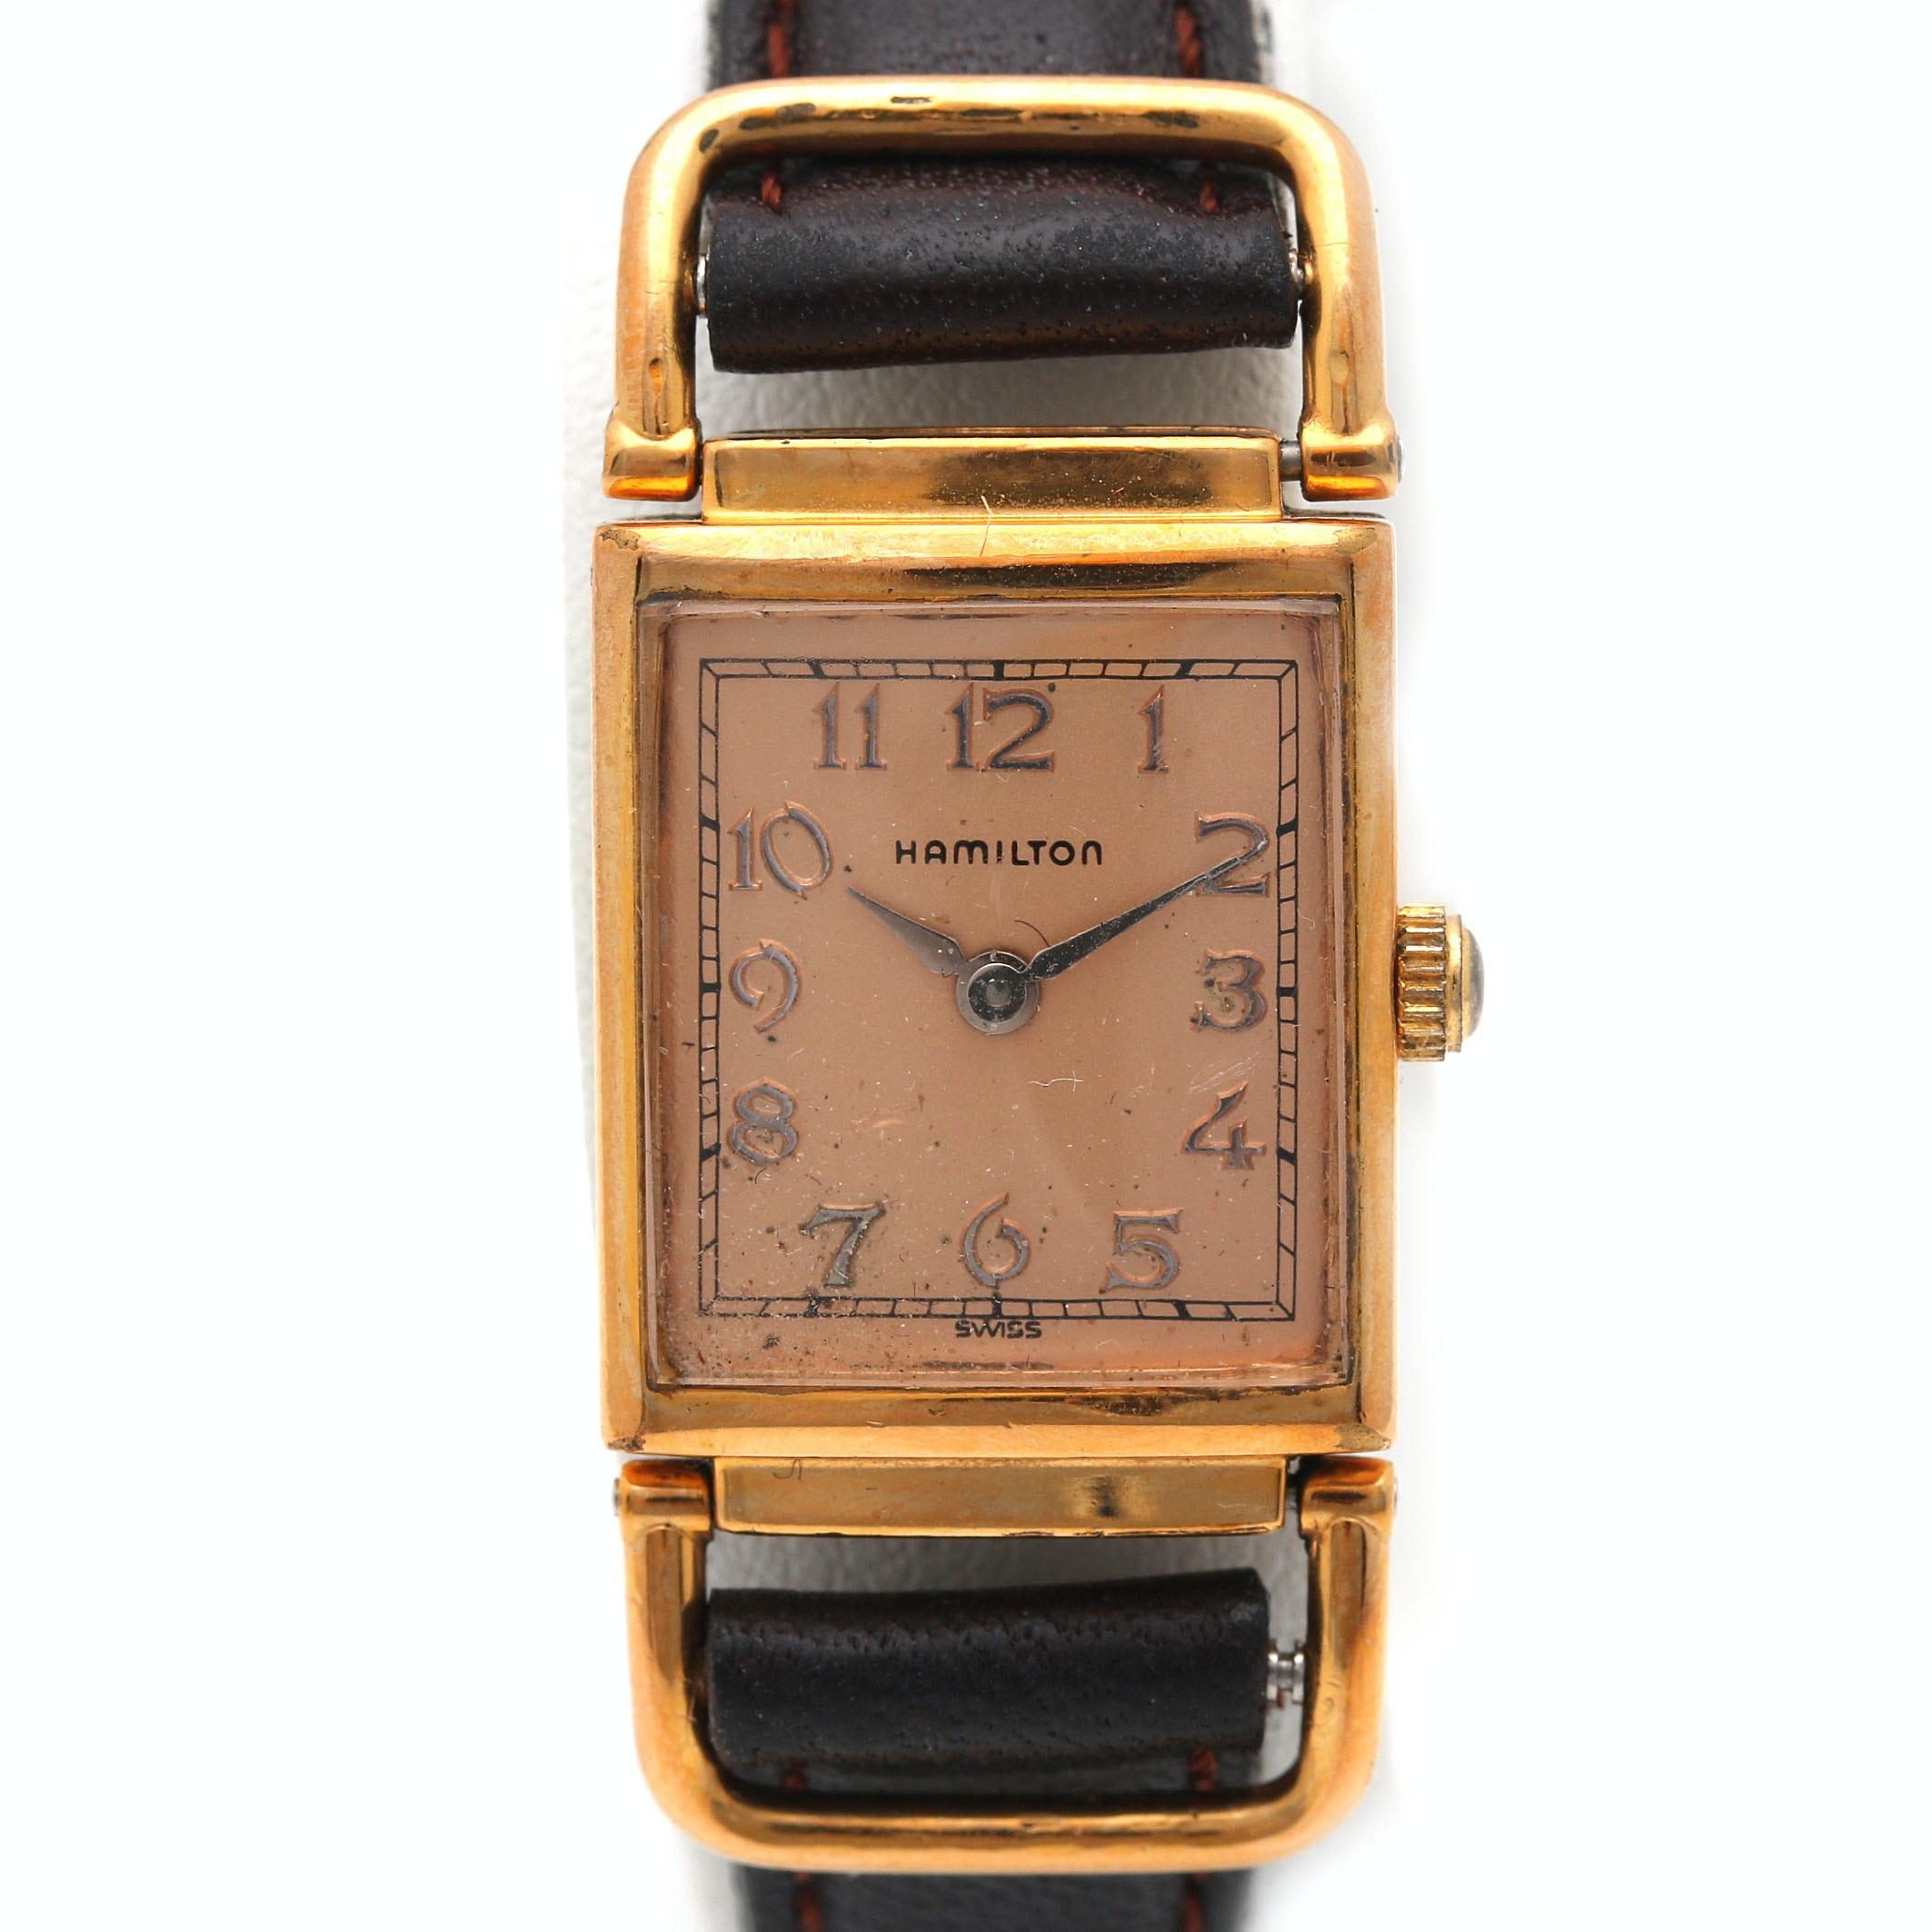 Limited Edition Hamilton Wristwatch